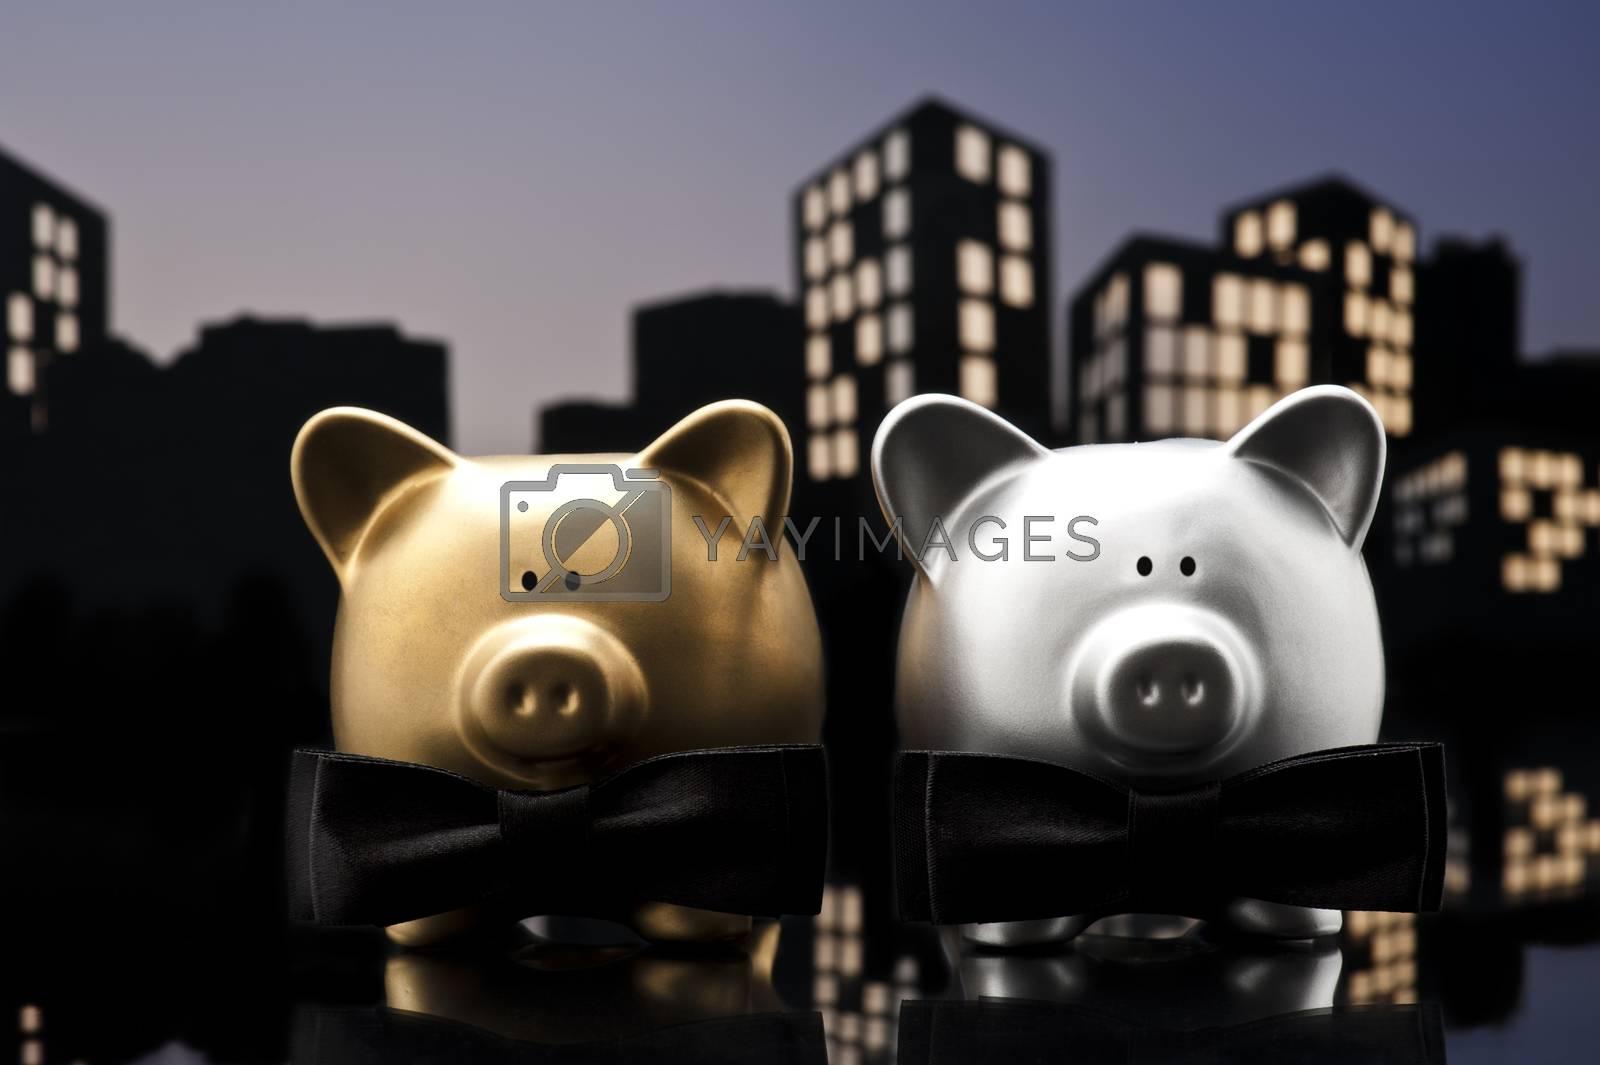 Metropolis City gay piggy bank civil union a close up